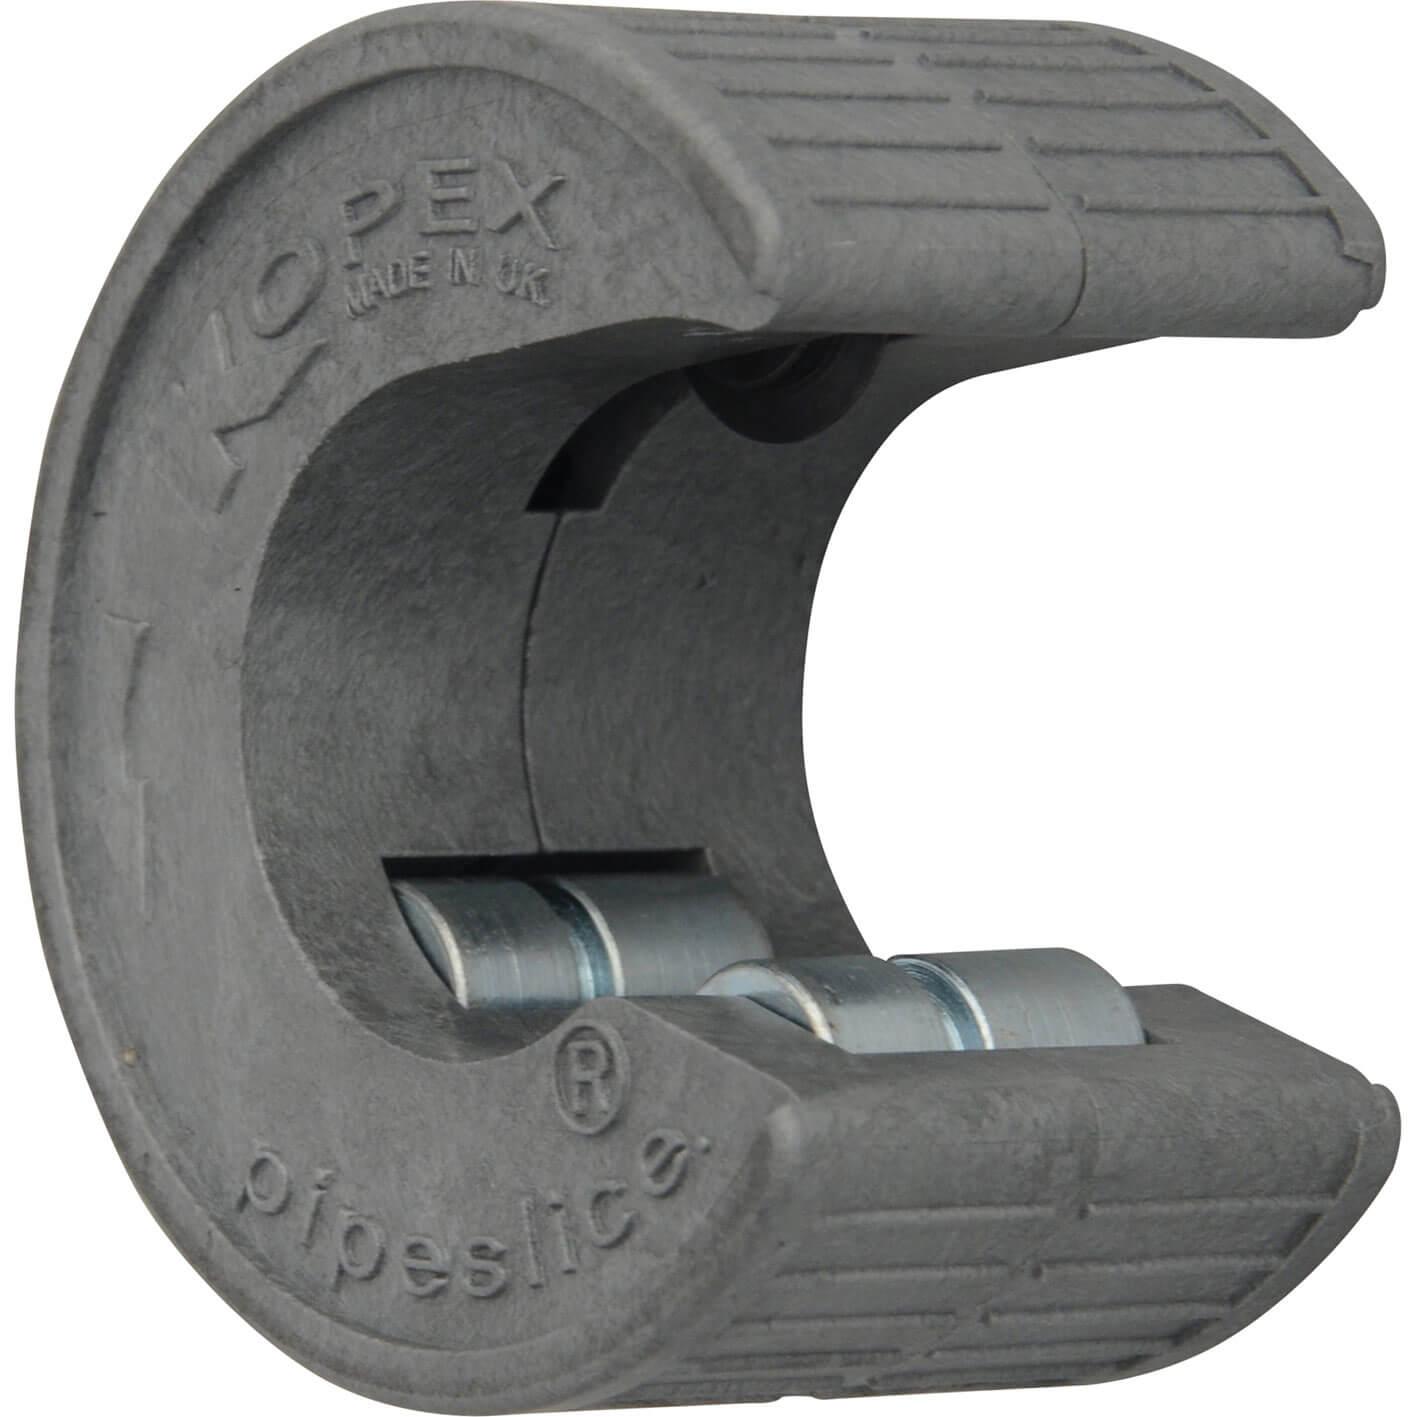 Image of Kopex Auto Copper Pipe Cutter 28mm